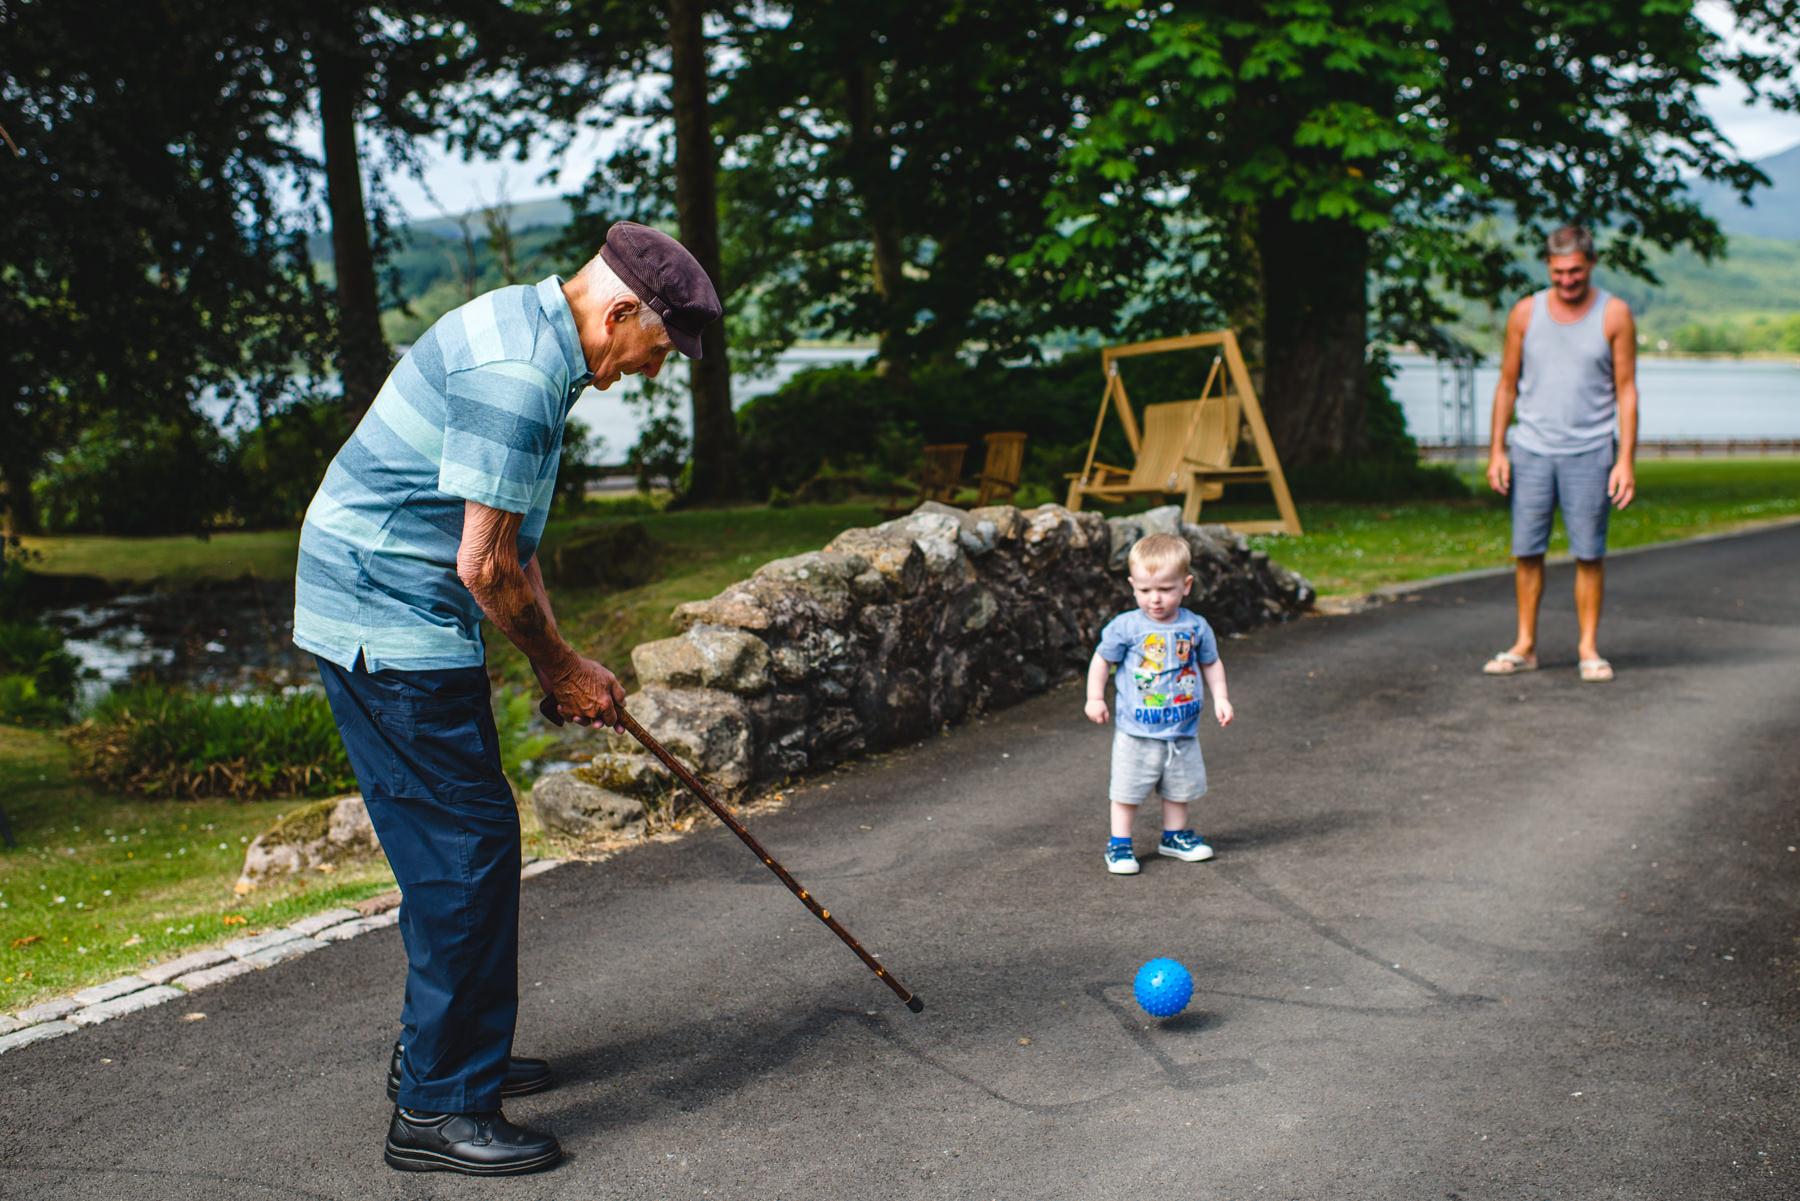 grandad playing golf with walking stick